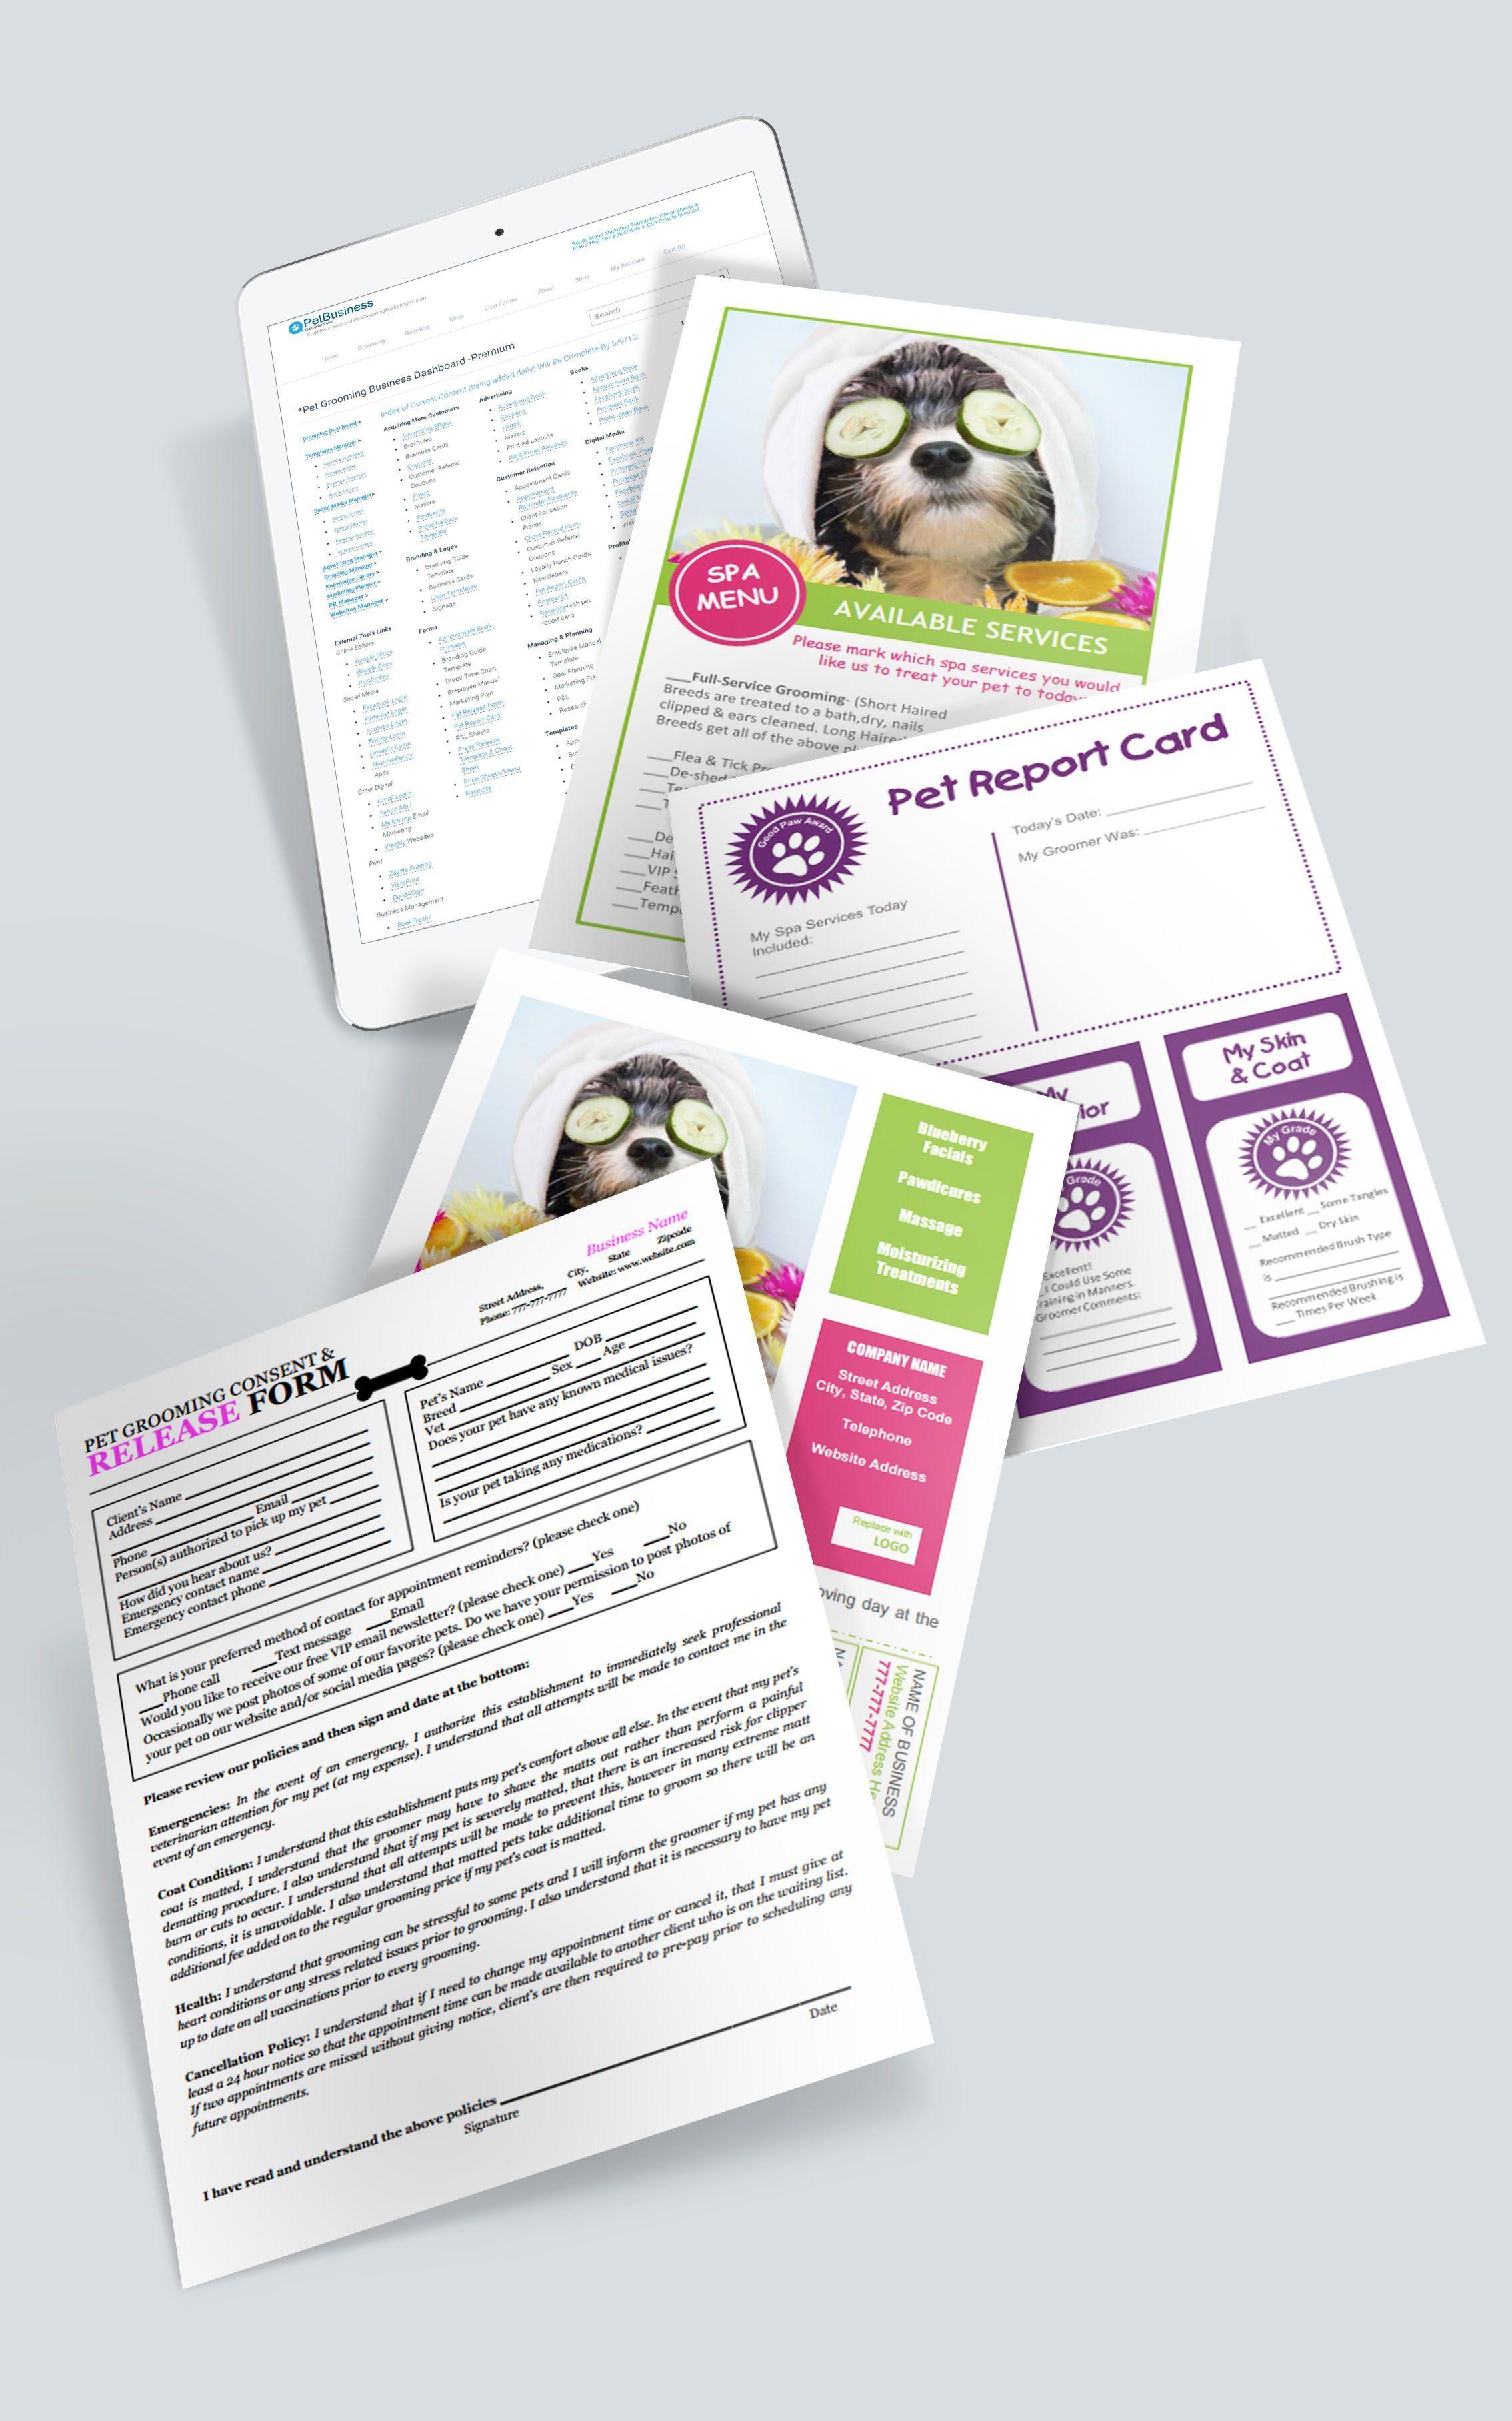 Pet Business Dashboard Marketing Ideas, Templates, Plans